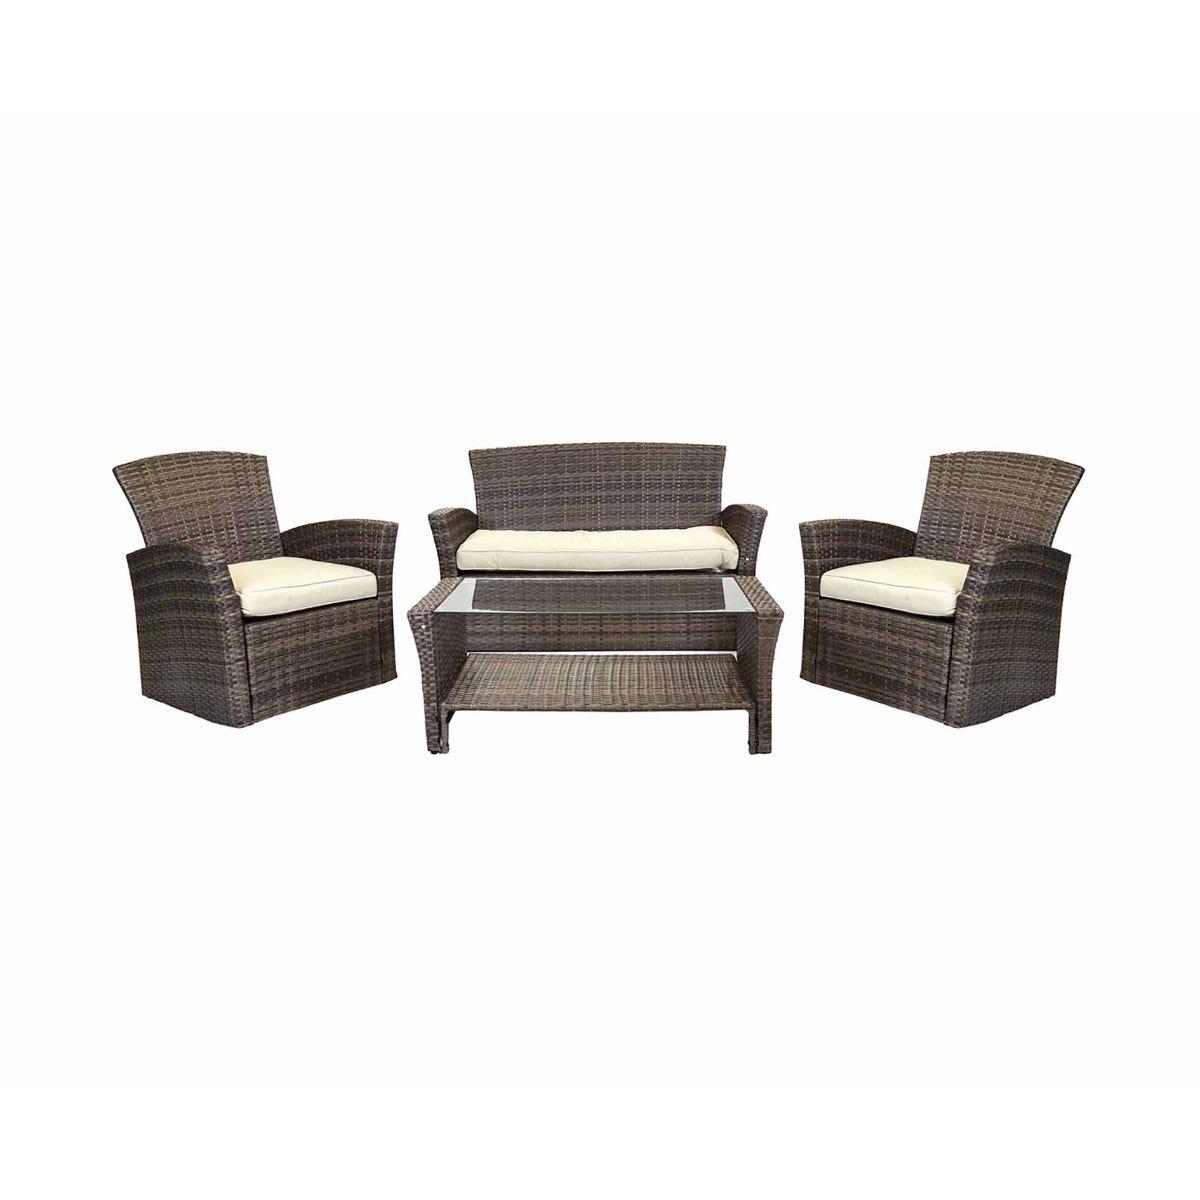 Charles Bentley Verona Deluxe Garden Rattan 4 Piece Table and Chairs Set, Brown